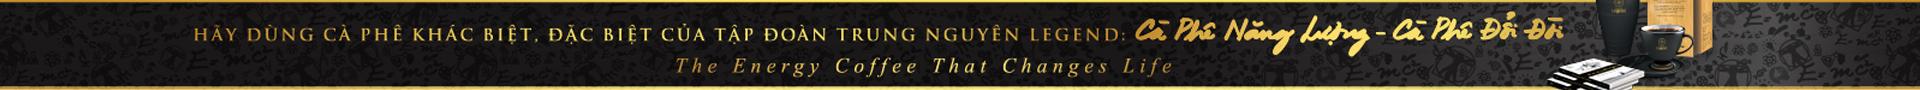 banner promotion